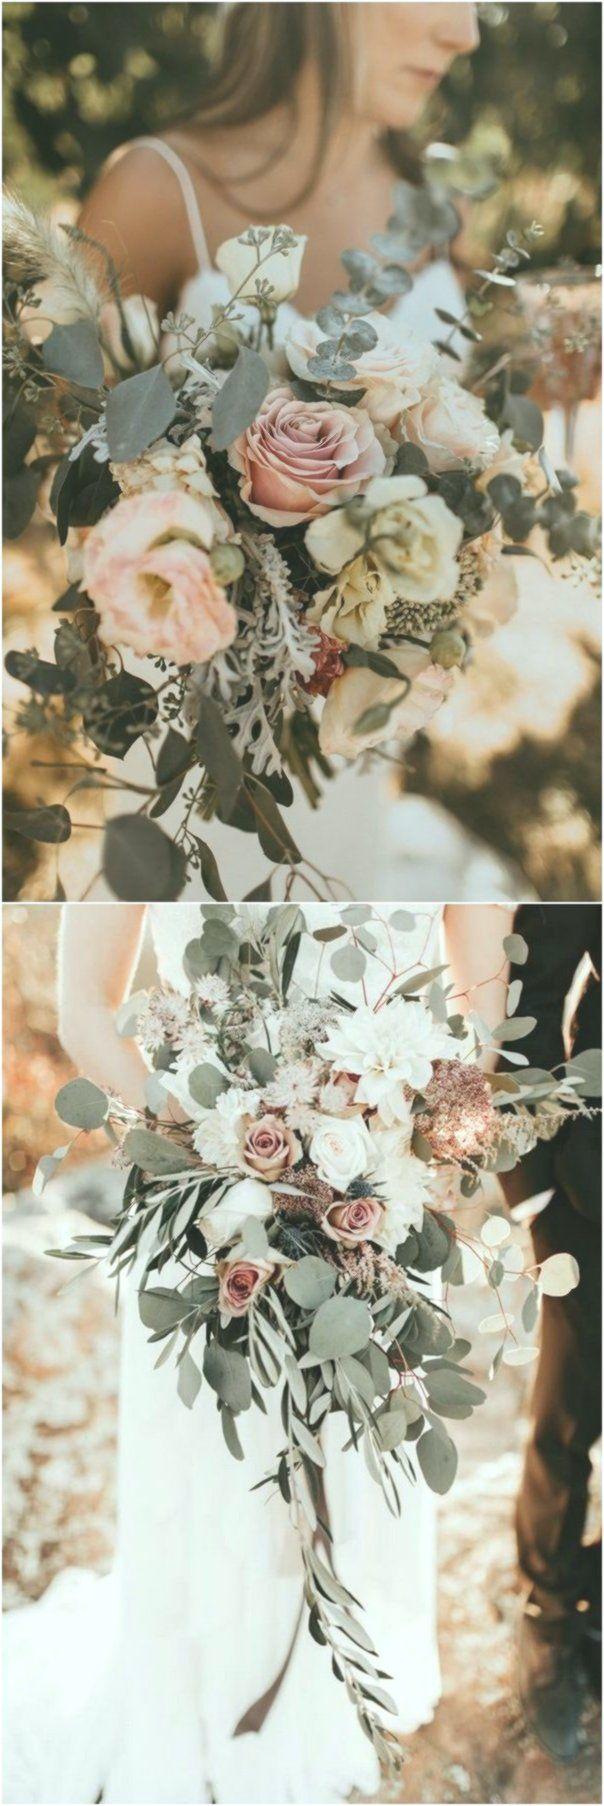 Top 20 Bohemian Fall Wedding Bouquets. colorful bohemian wedding dresses | boho …